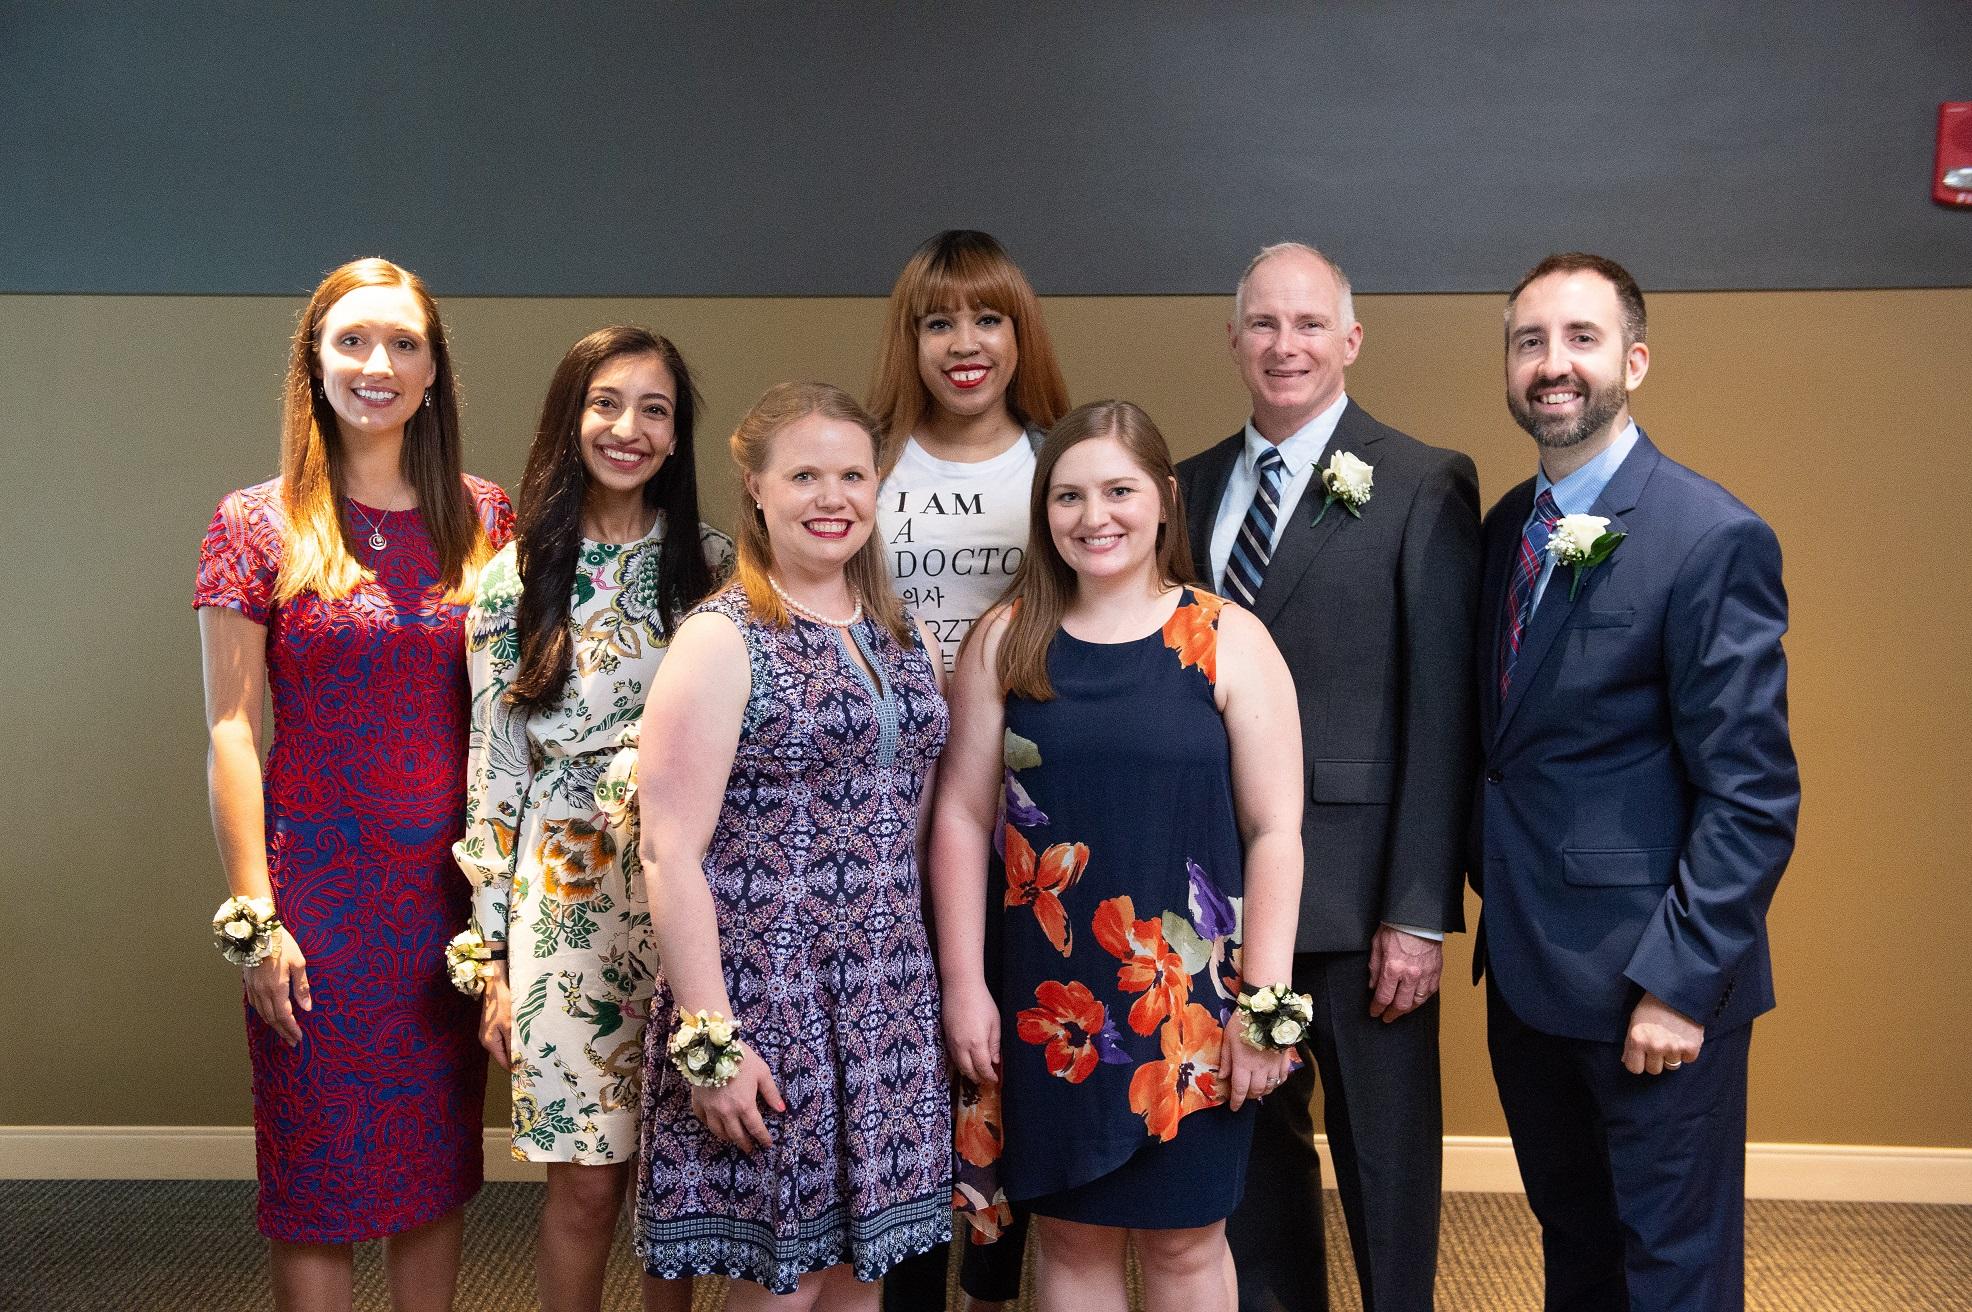 Class of 2019 photo